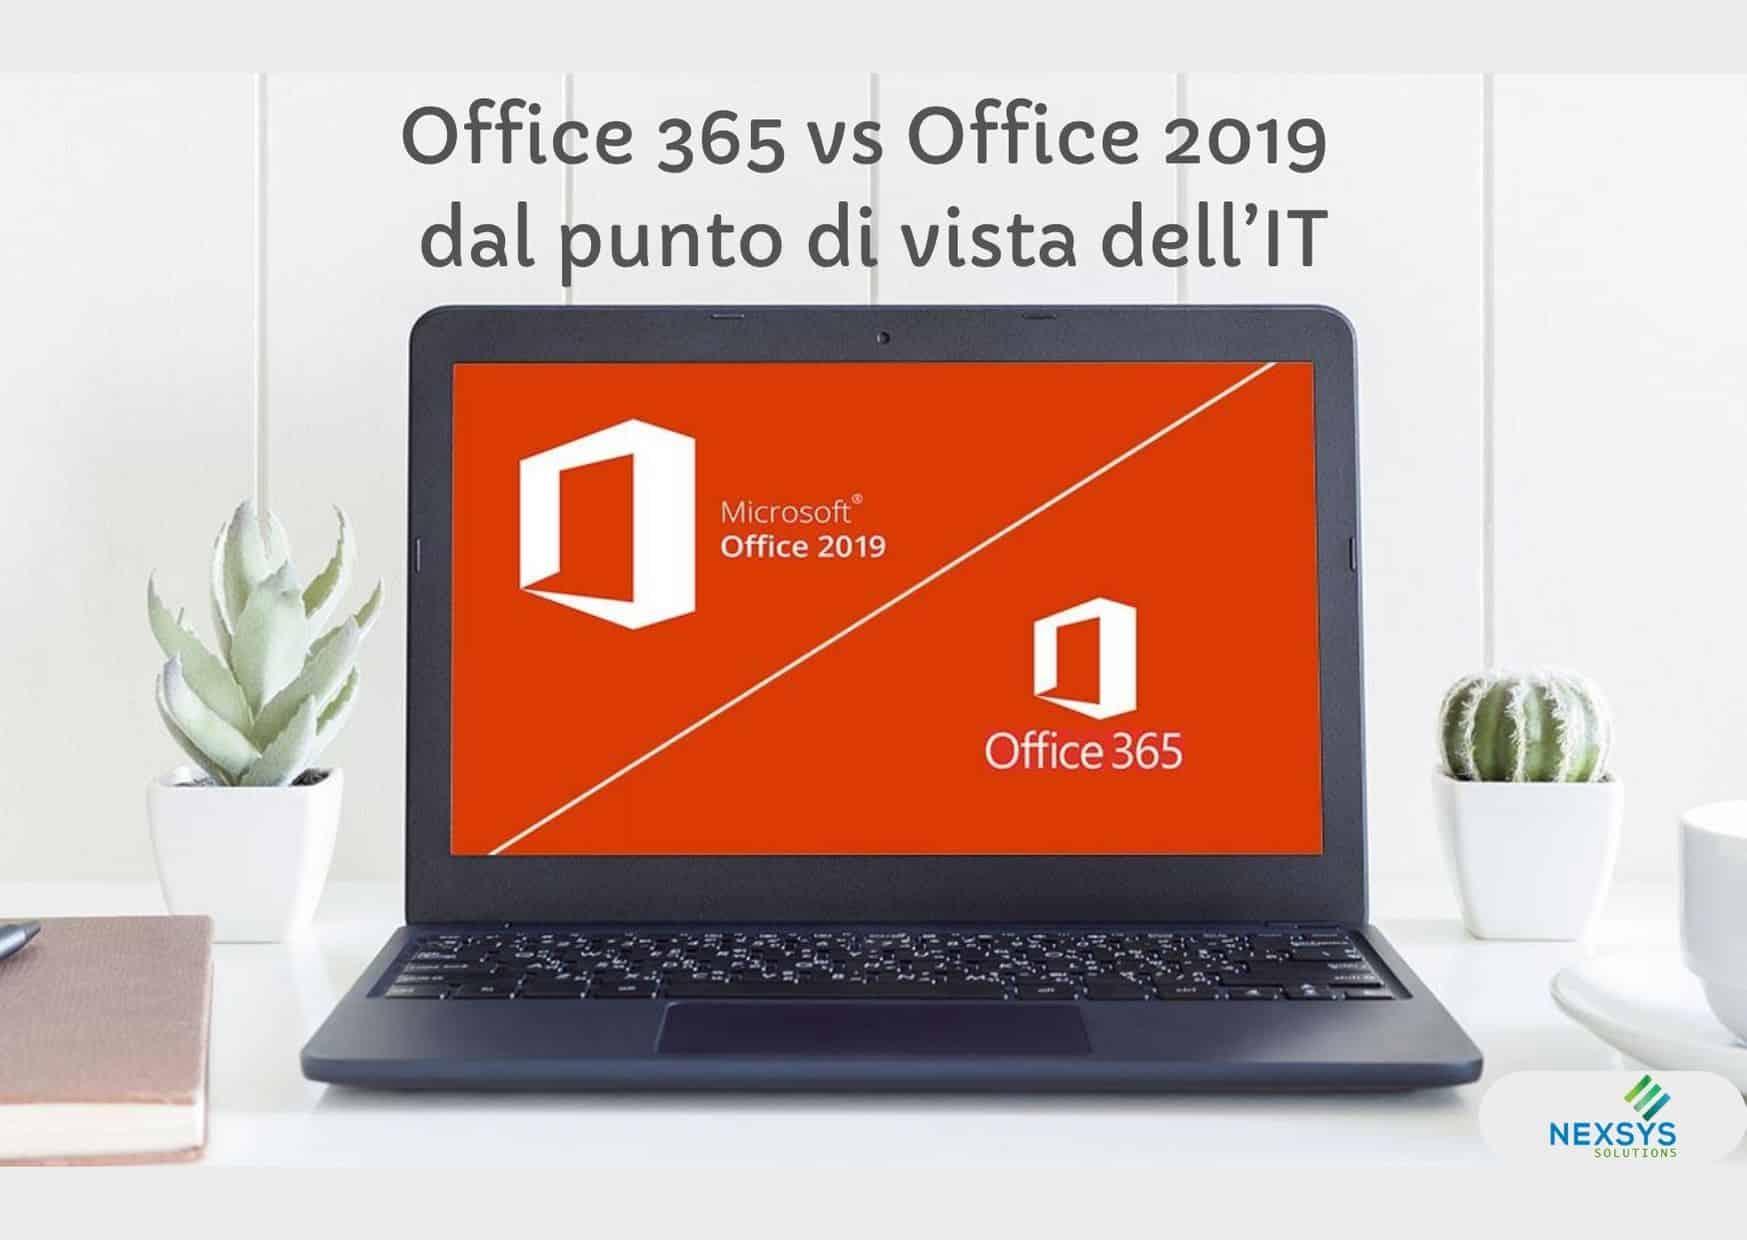 Office 365 vs Office 2019